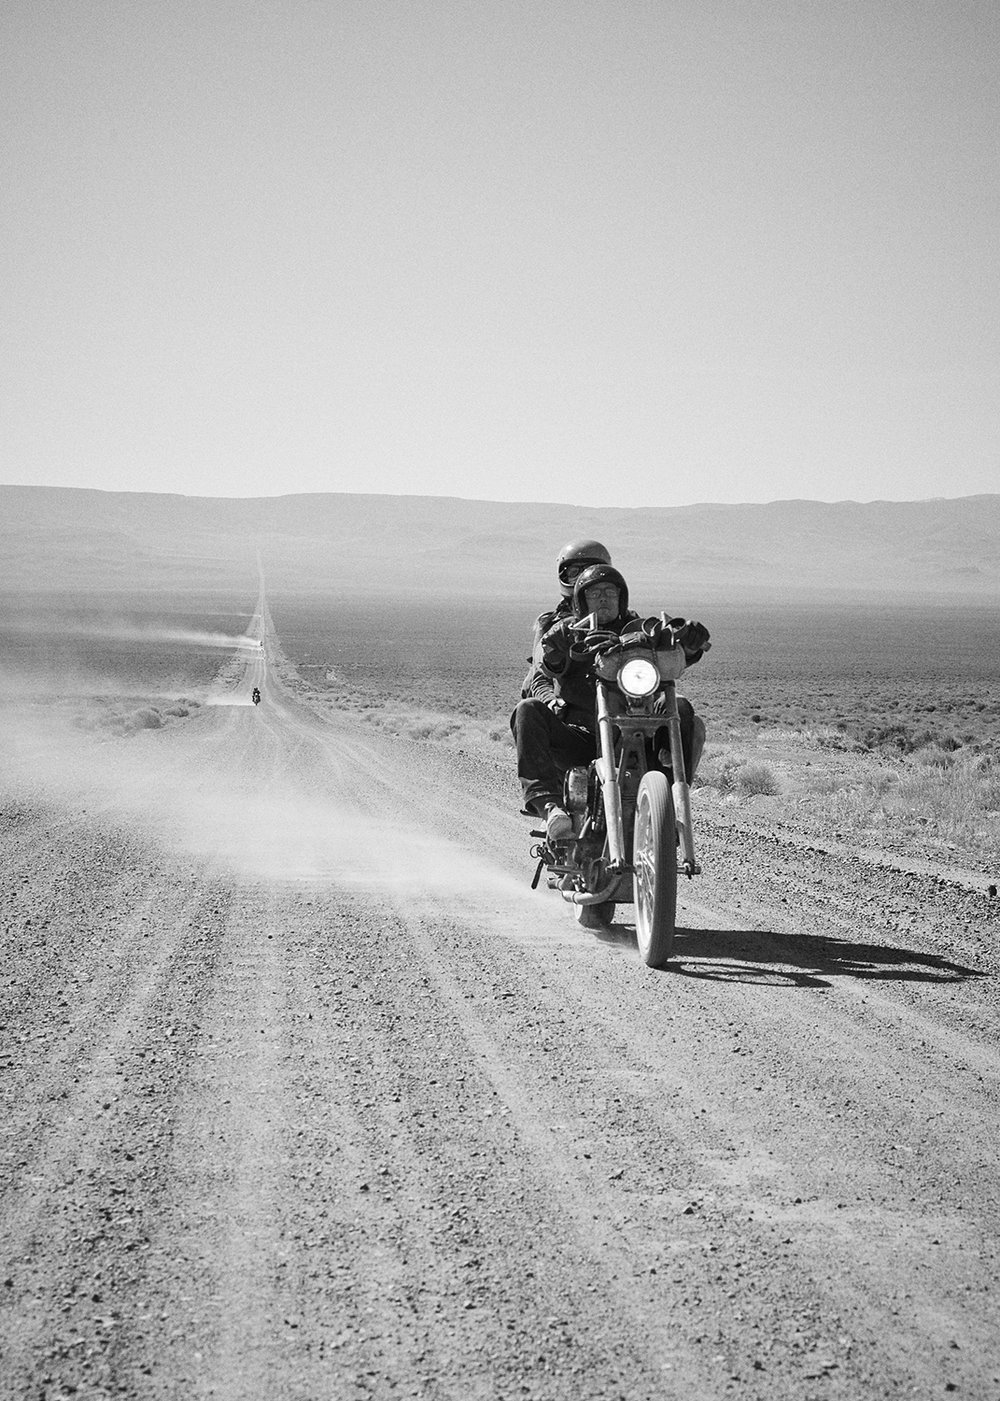 Rob_Williamson_robistall_motorcycles_23.jpg